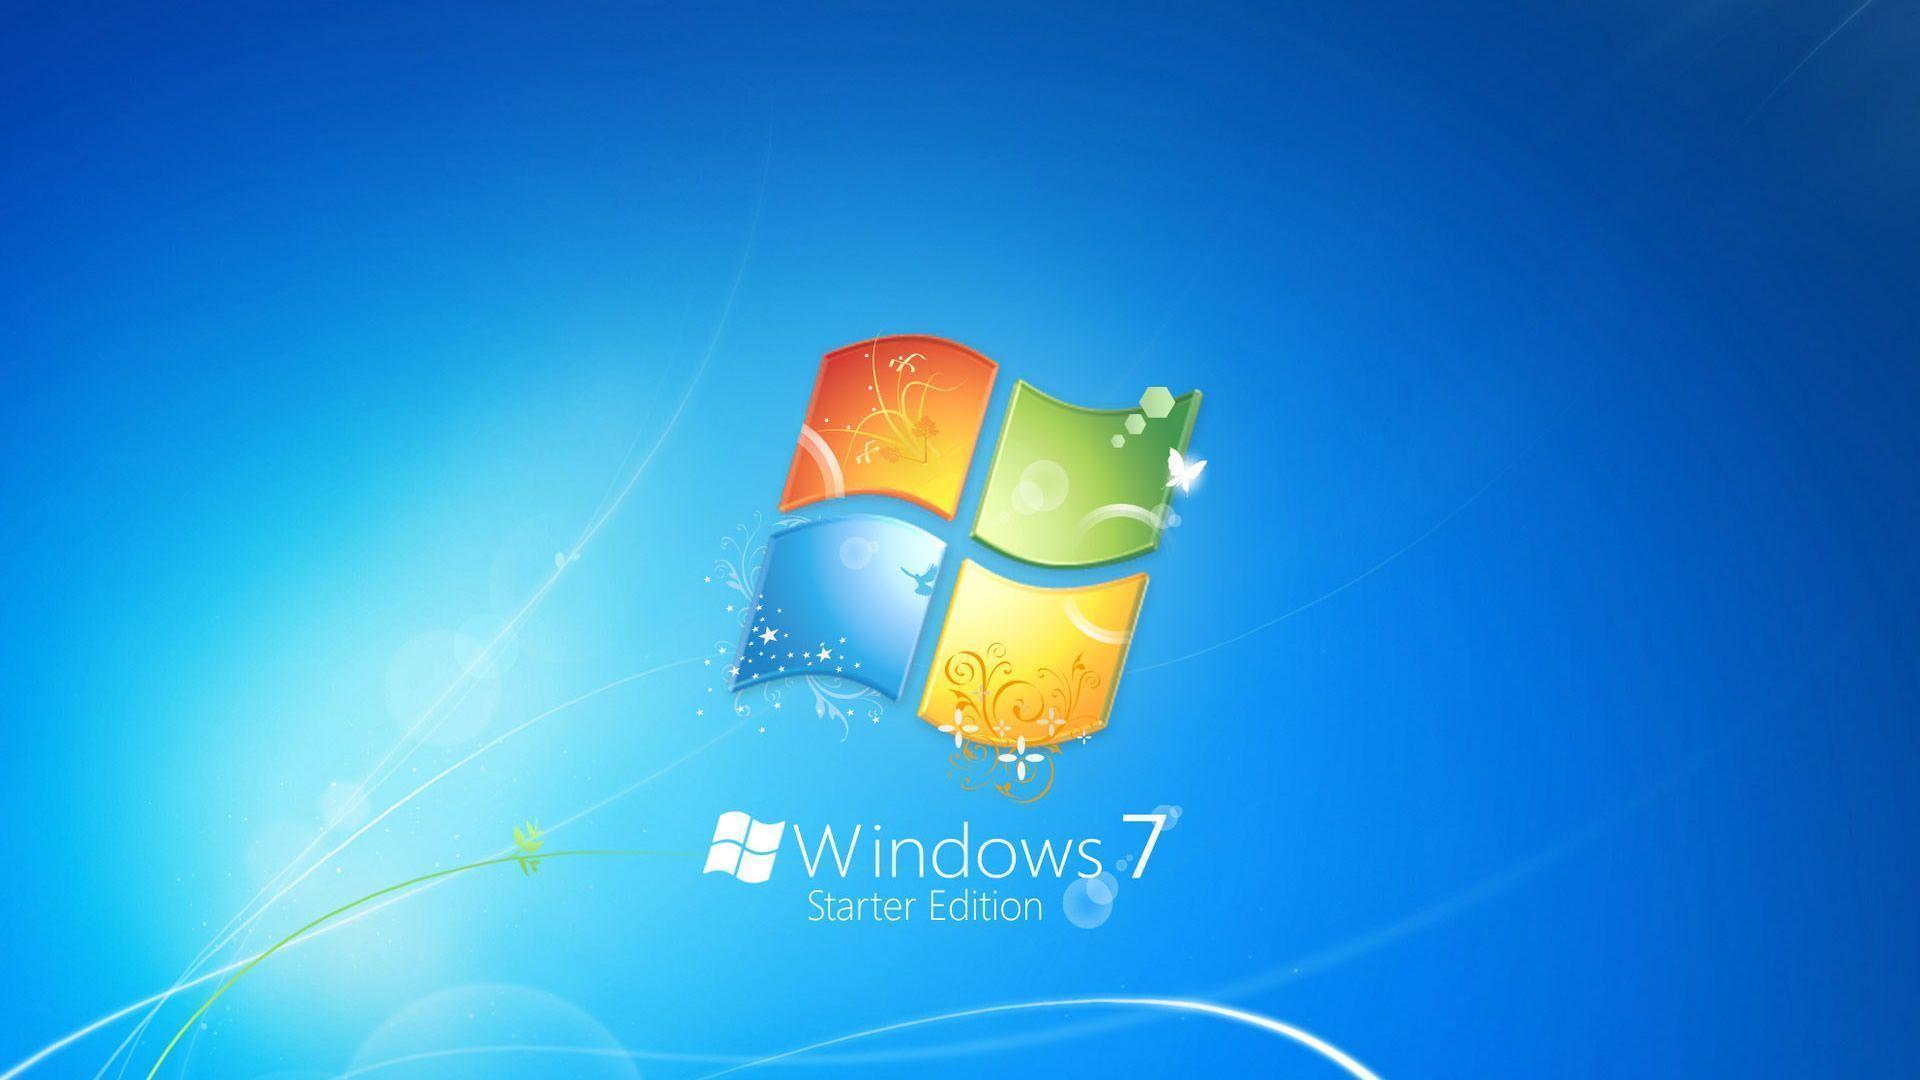 Windows 7 Background 1920x1080 67517 SUPERCOLOR